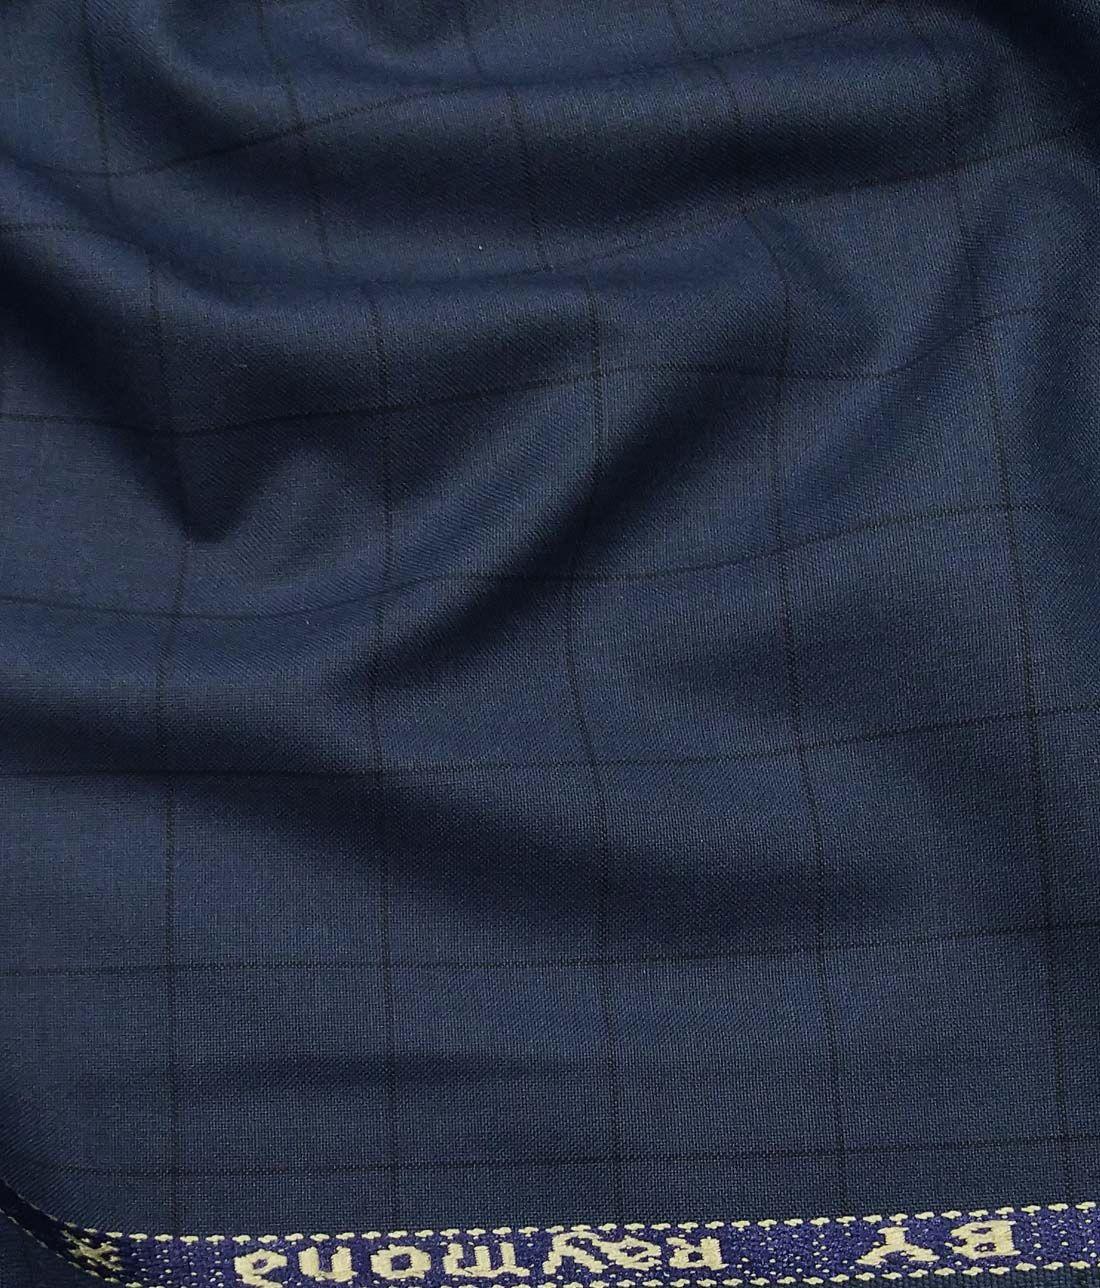 1f6e4076f Combo of Raymond Aegean Blue Checks Trouser Fabric With Nemesis Sky Blue  100% Giza Cotton White Printed Shirt Fabric (Unstitched)